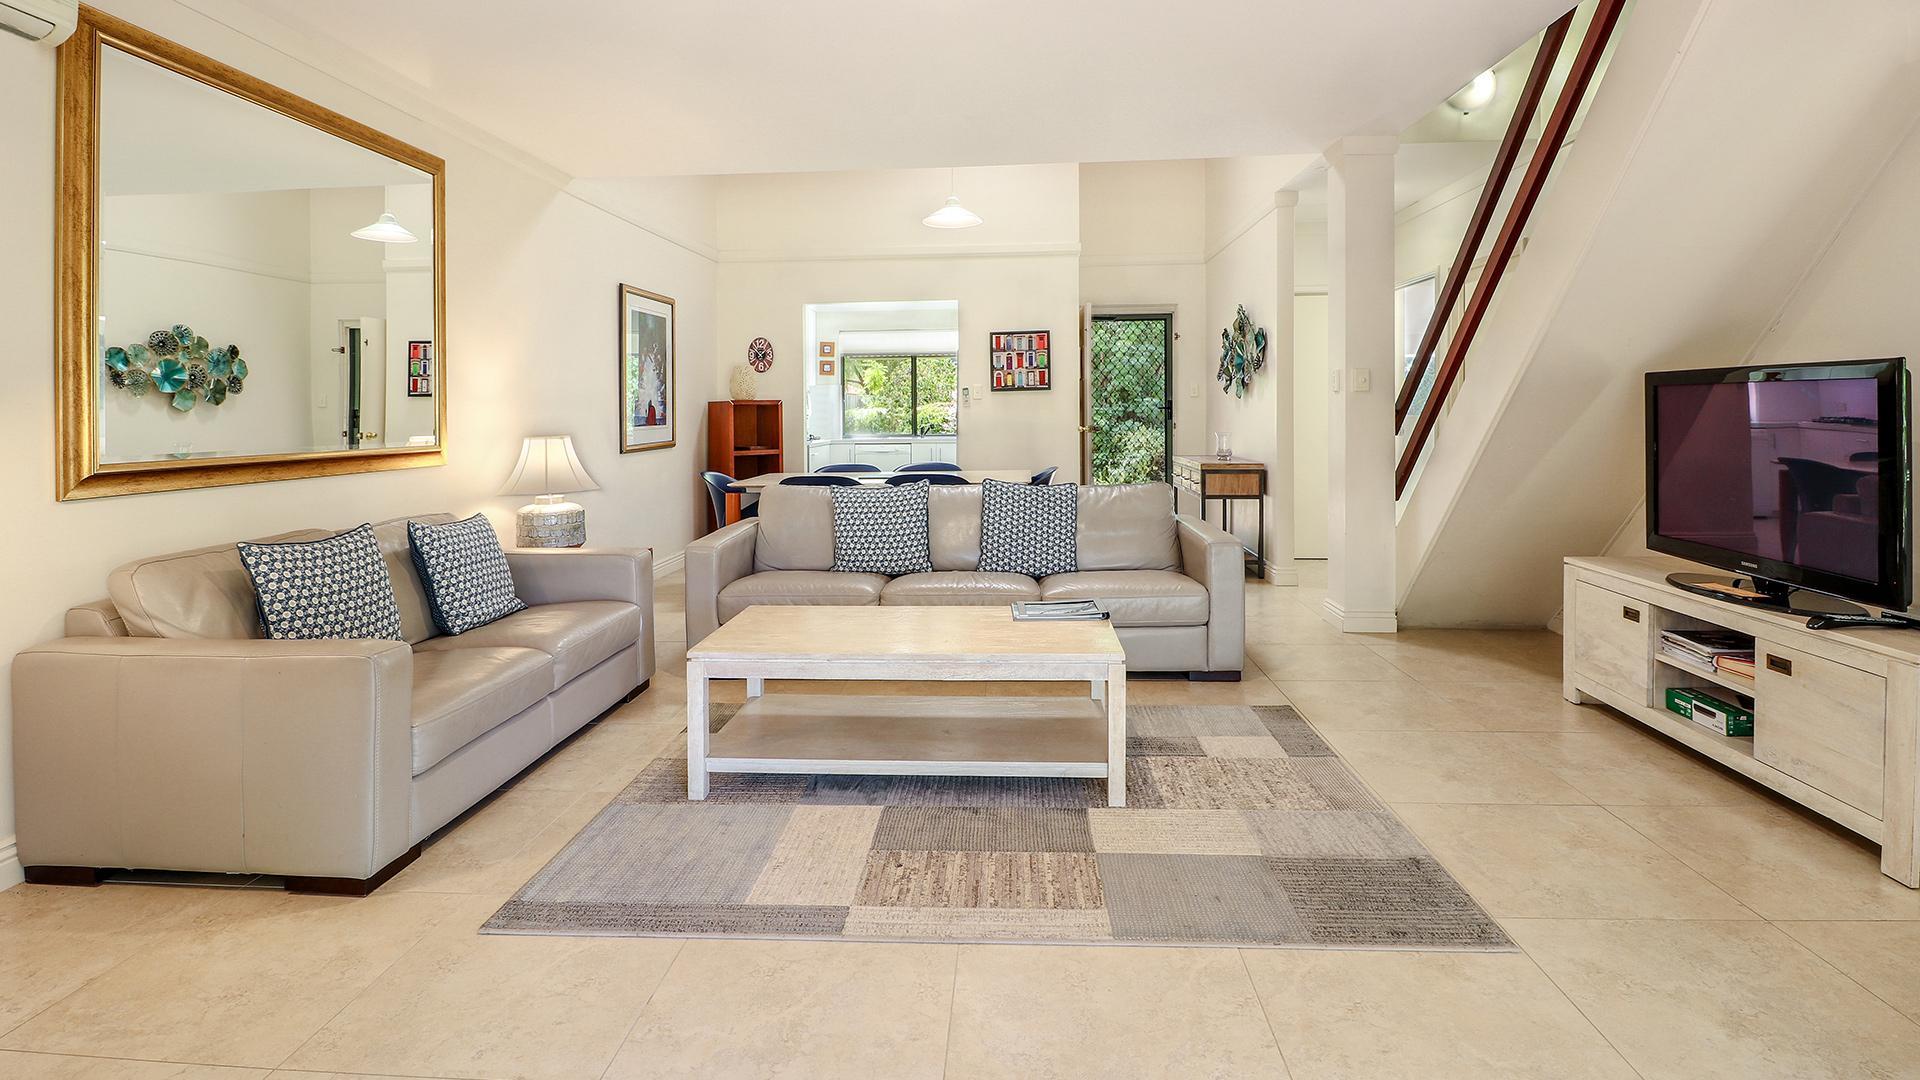 Three-Bedroom Villa image 1 at Bayshore Beachside Resort by City of Busselton, Western Australia, Australia